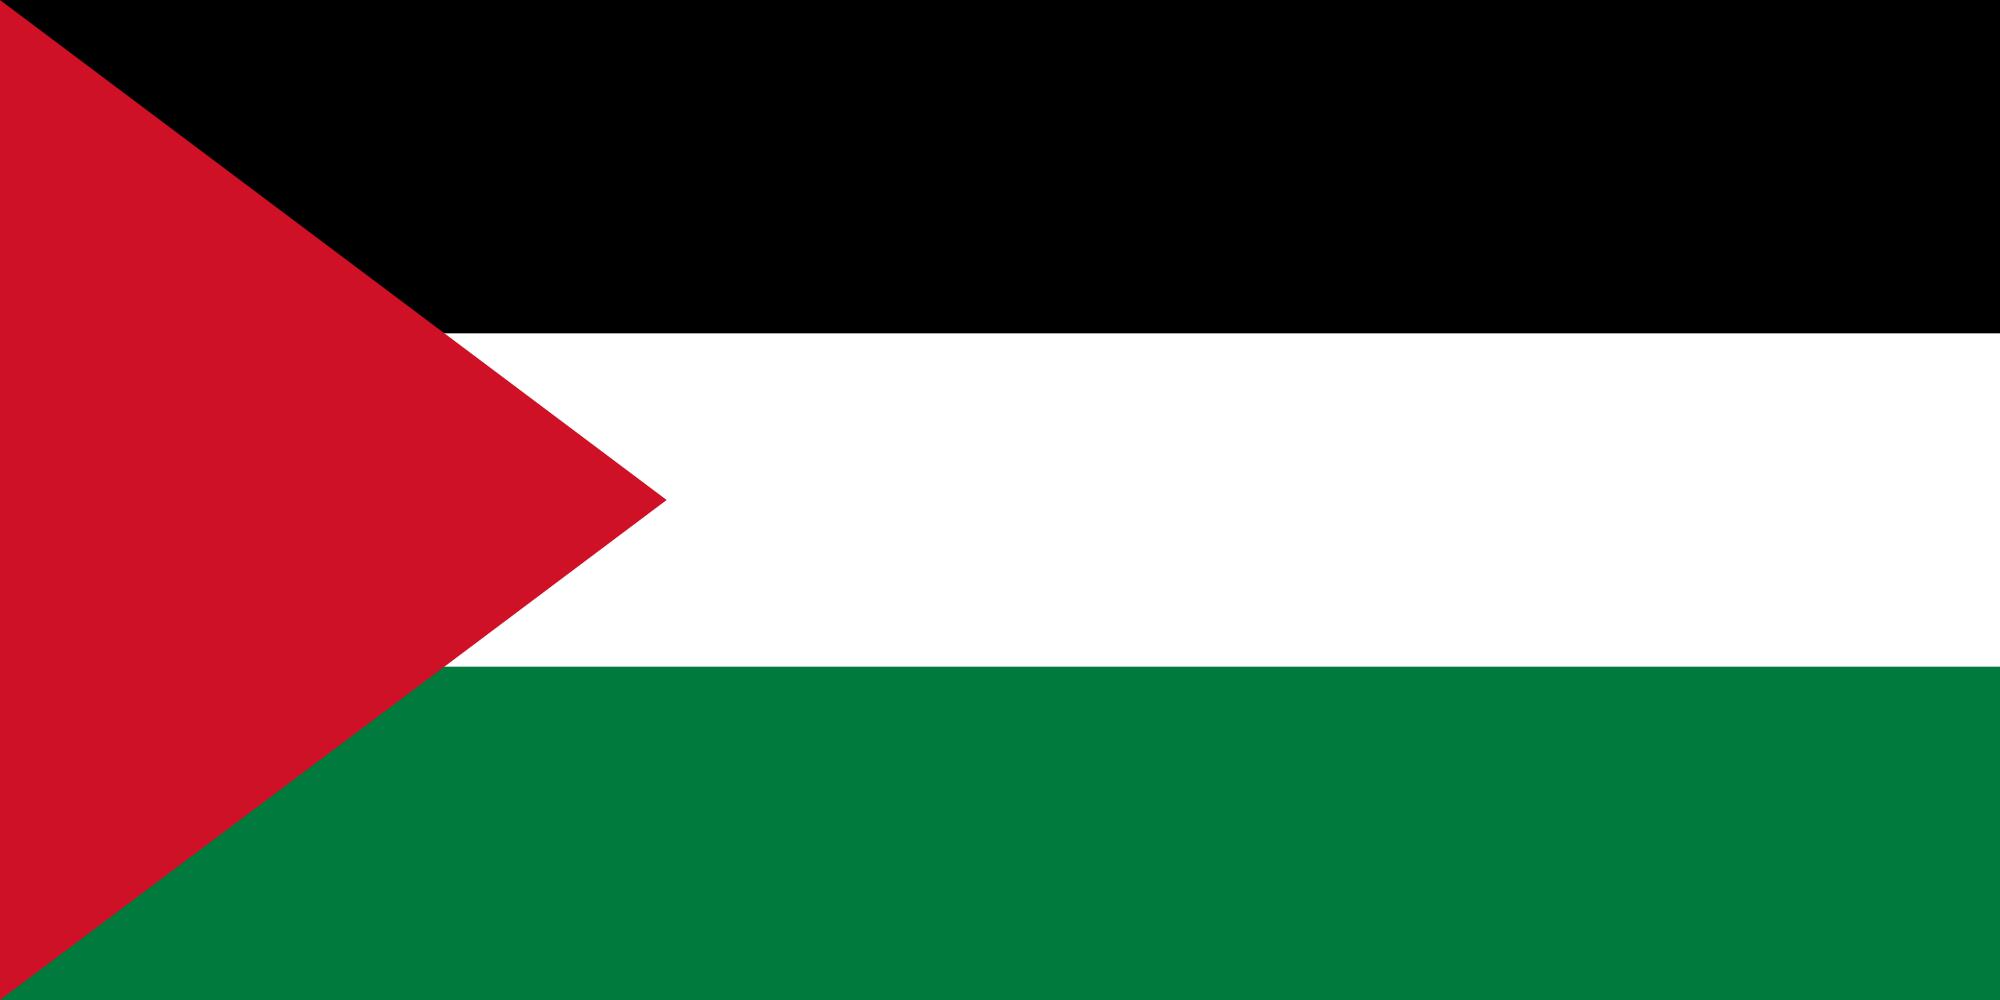 palestina, 国家, 会徽, 徽标, 符号 - 高清壁纸 - 教授-falken.com